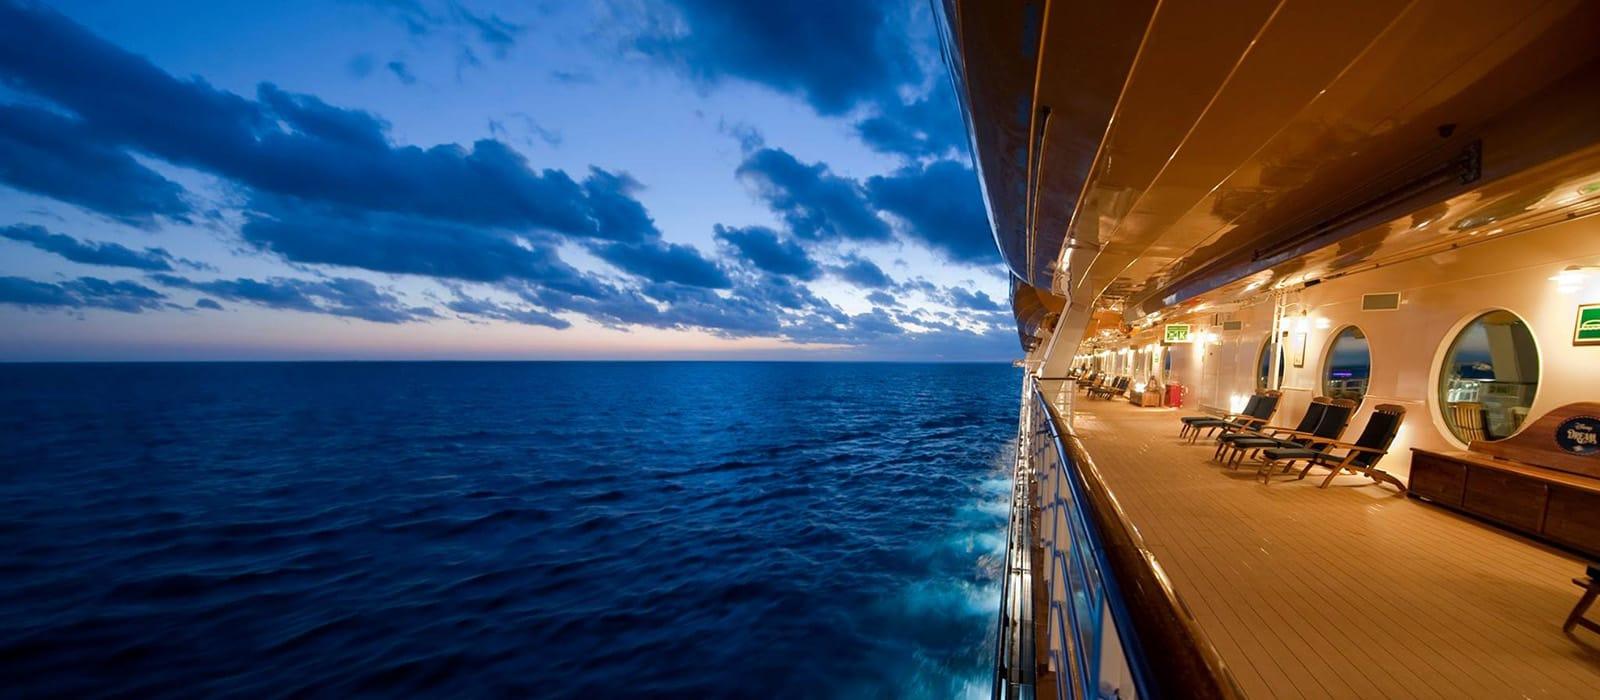 Disney Cruise Line <br> komt naar Amsterdam